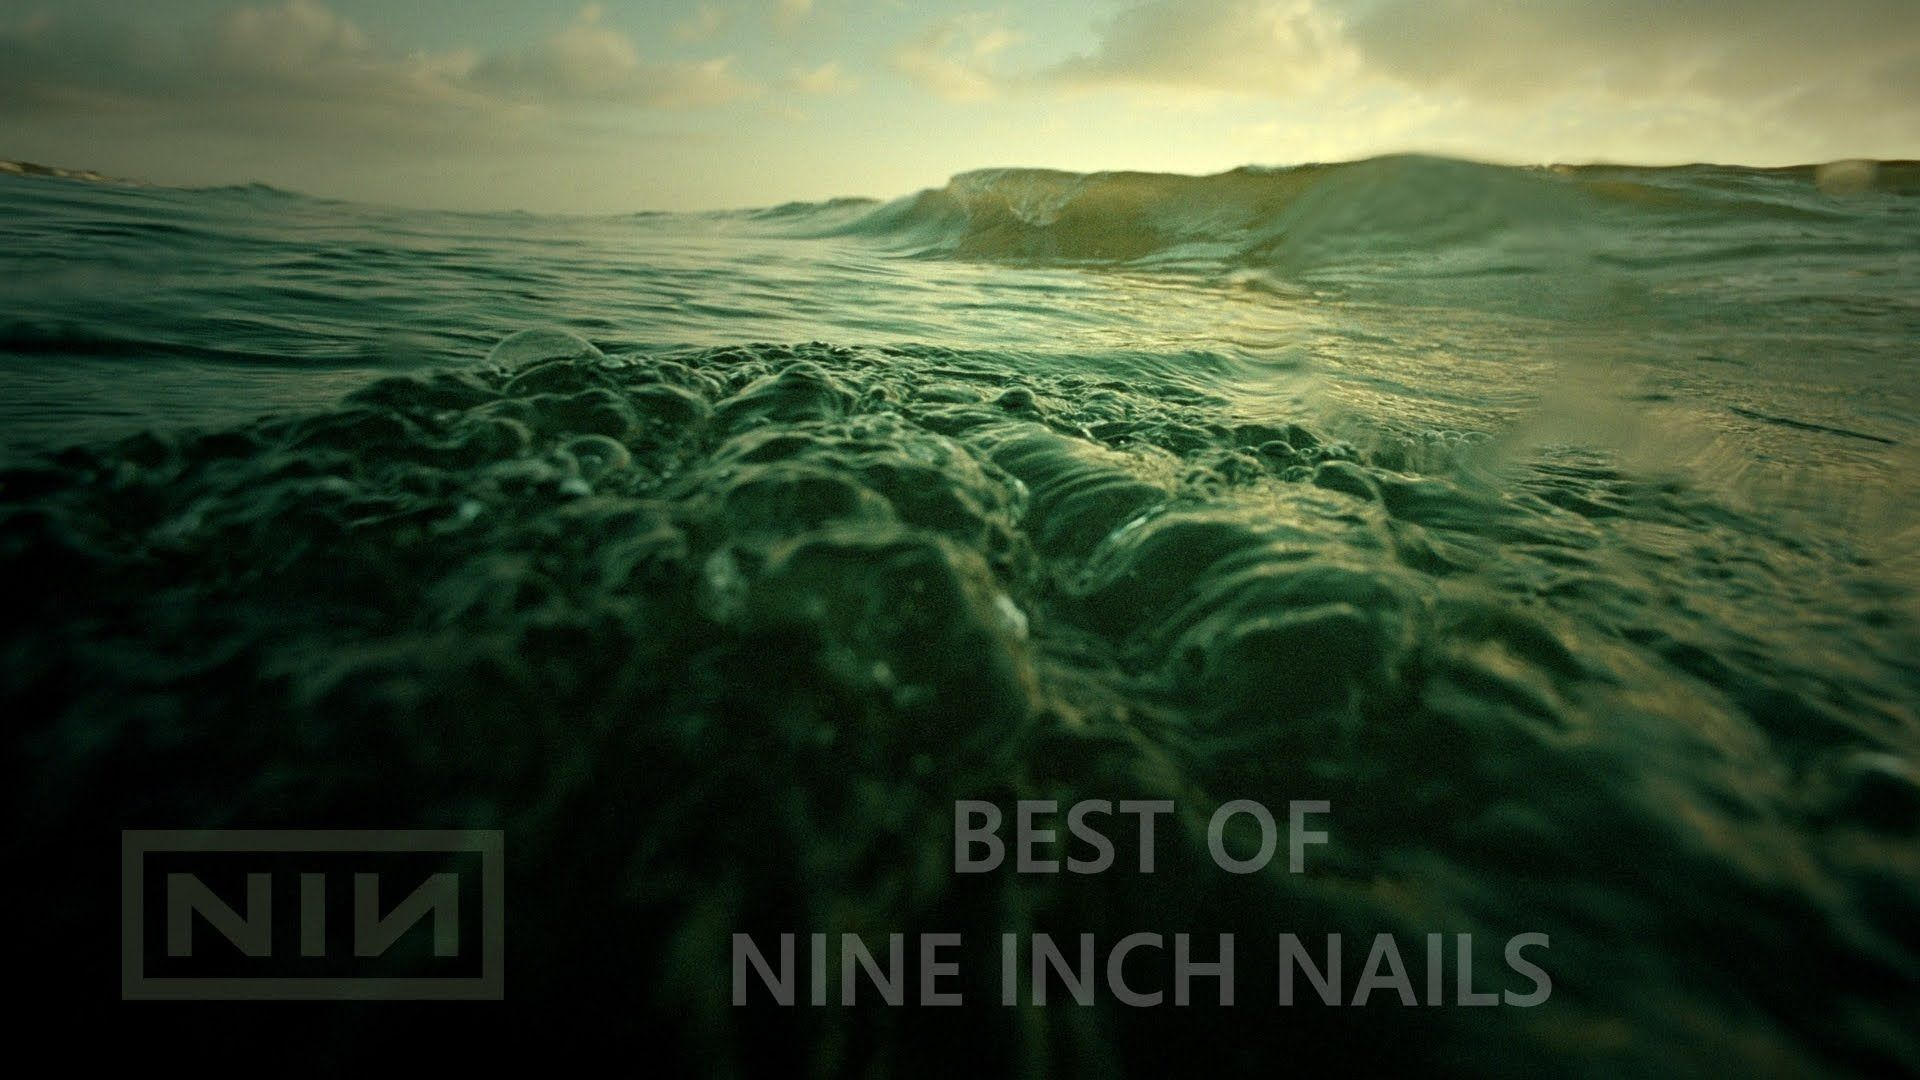 Best of Nine Inch Nails   NIN   Pinterest